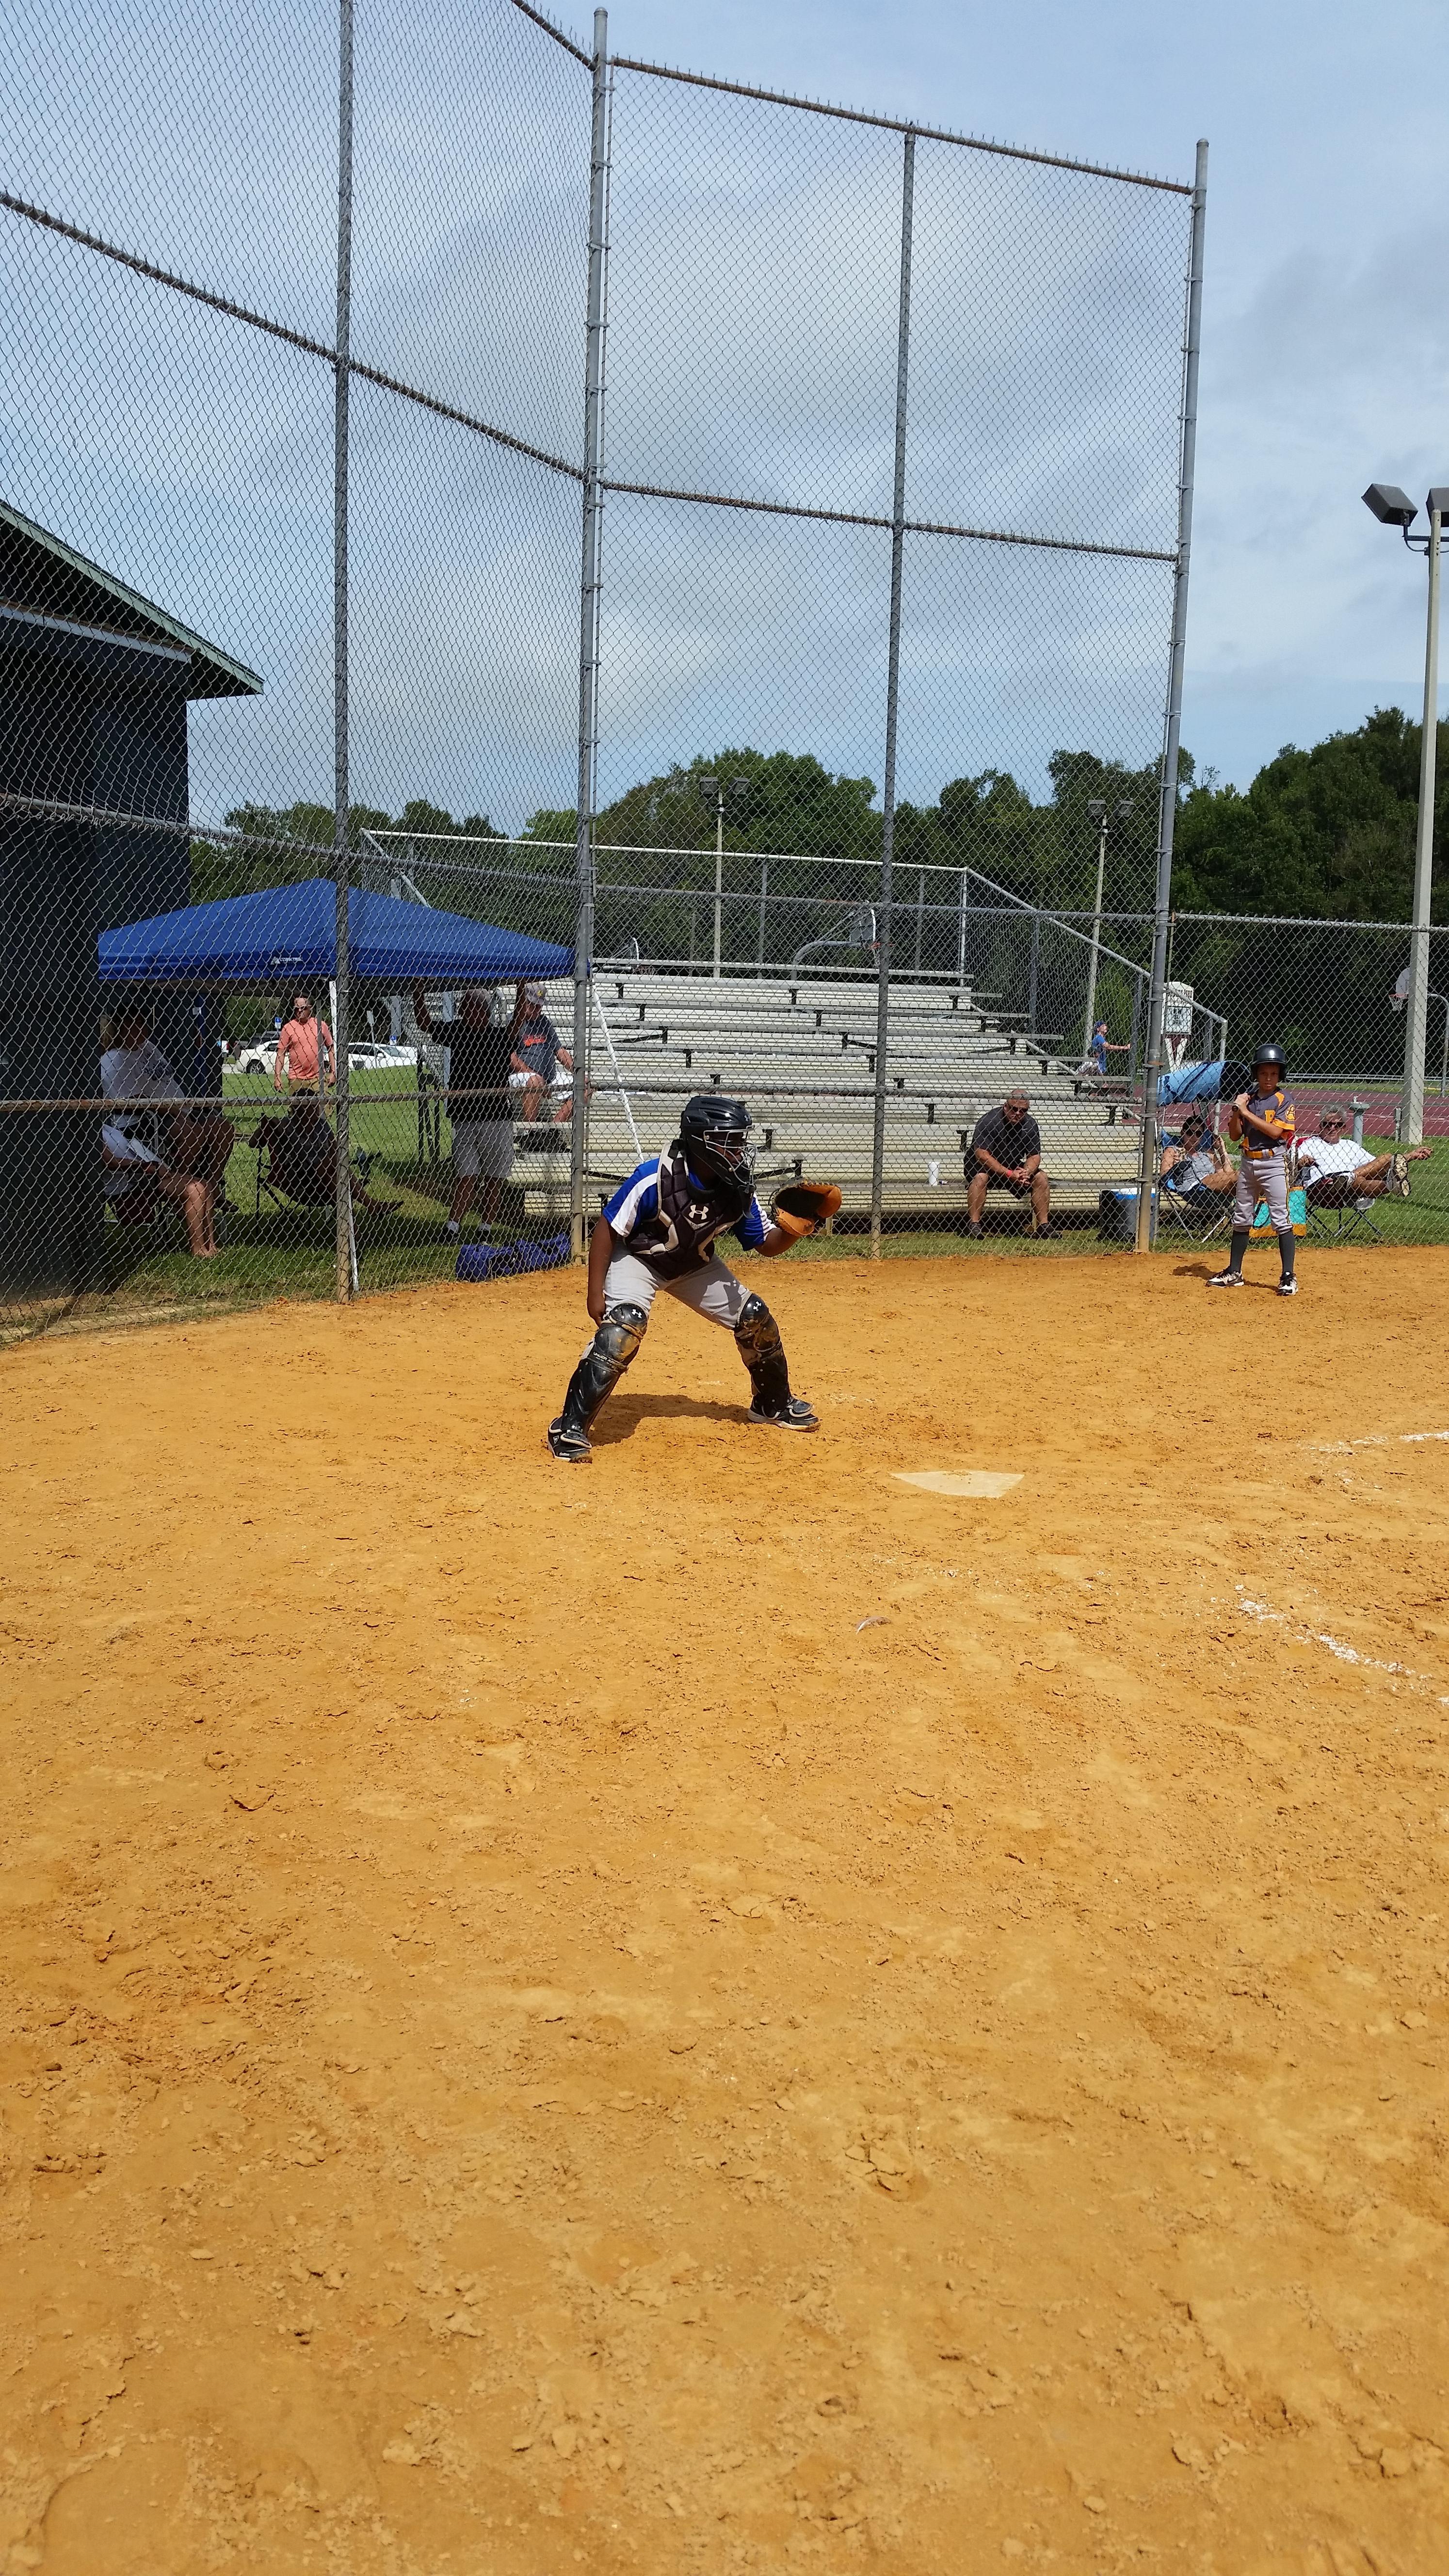 08-29-2015 Kylin Carter - Wrigley Baseball-Citra FL